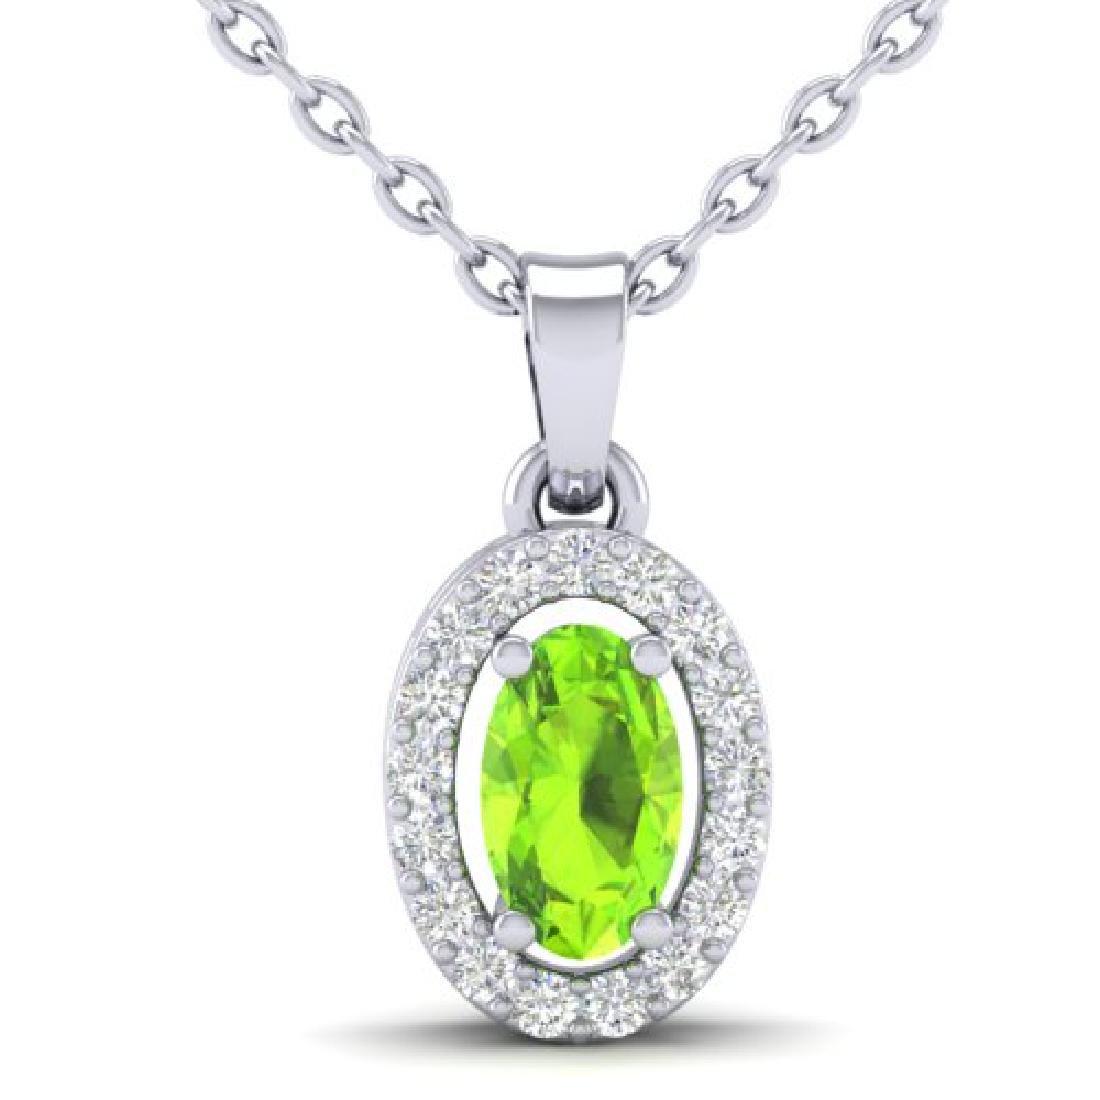 0.41 CTW Peridot & Micro Pave VS/SI Diamond Necklace